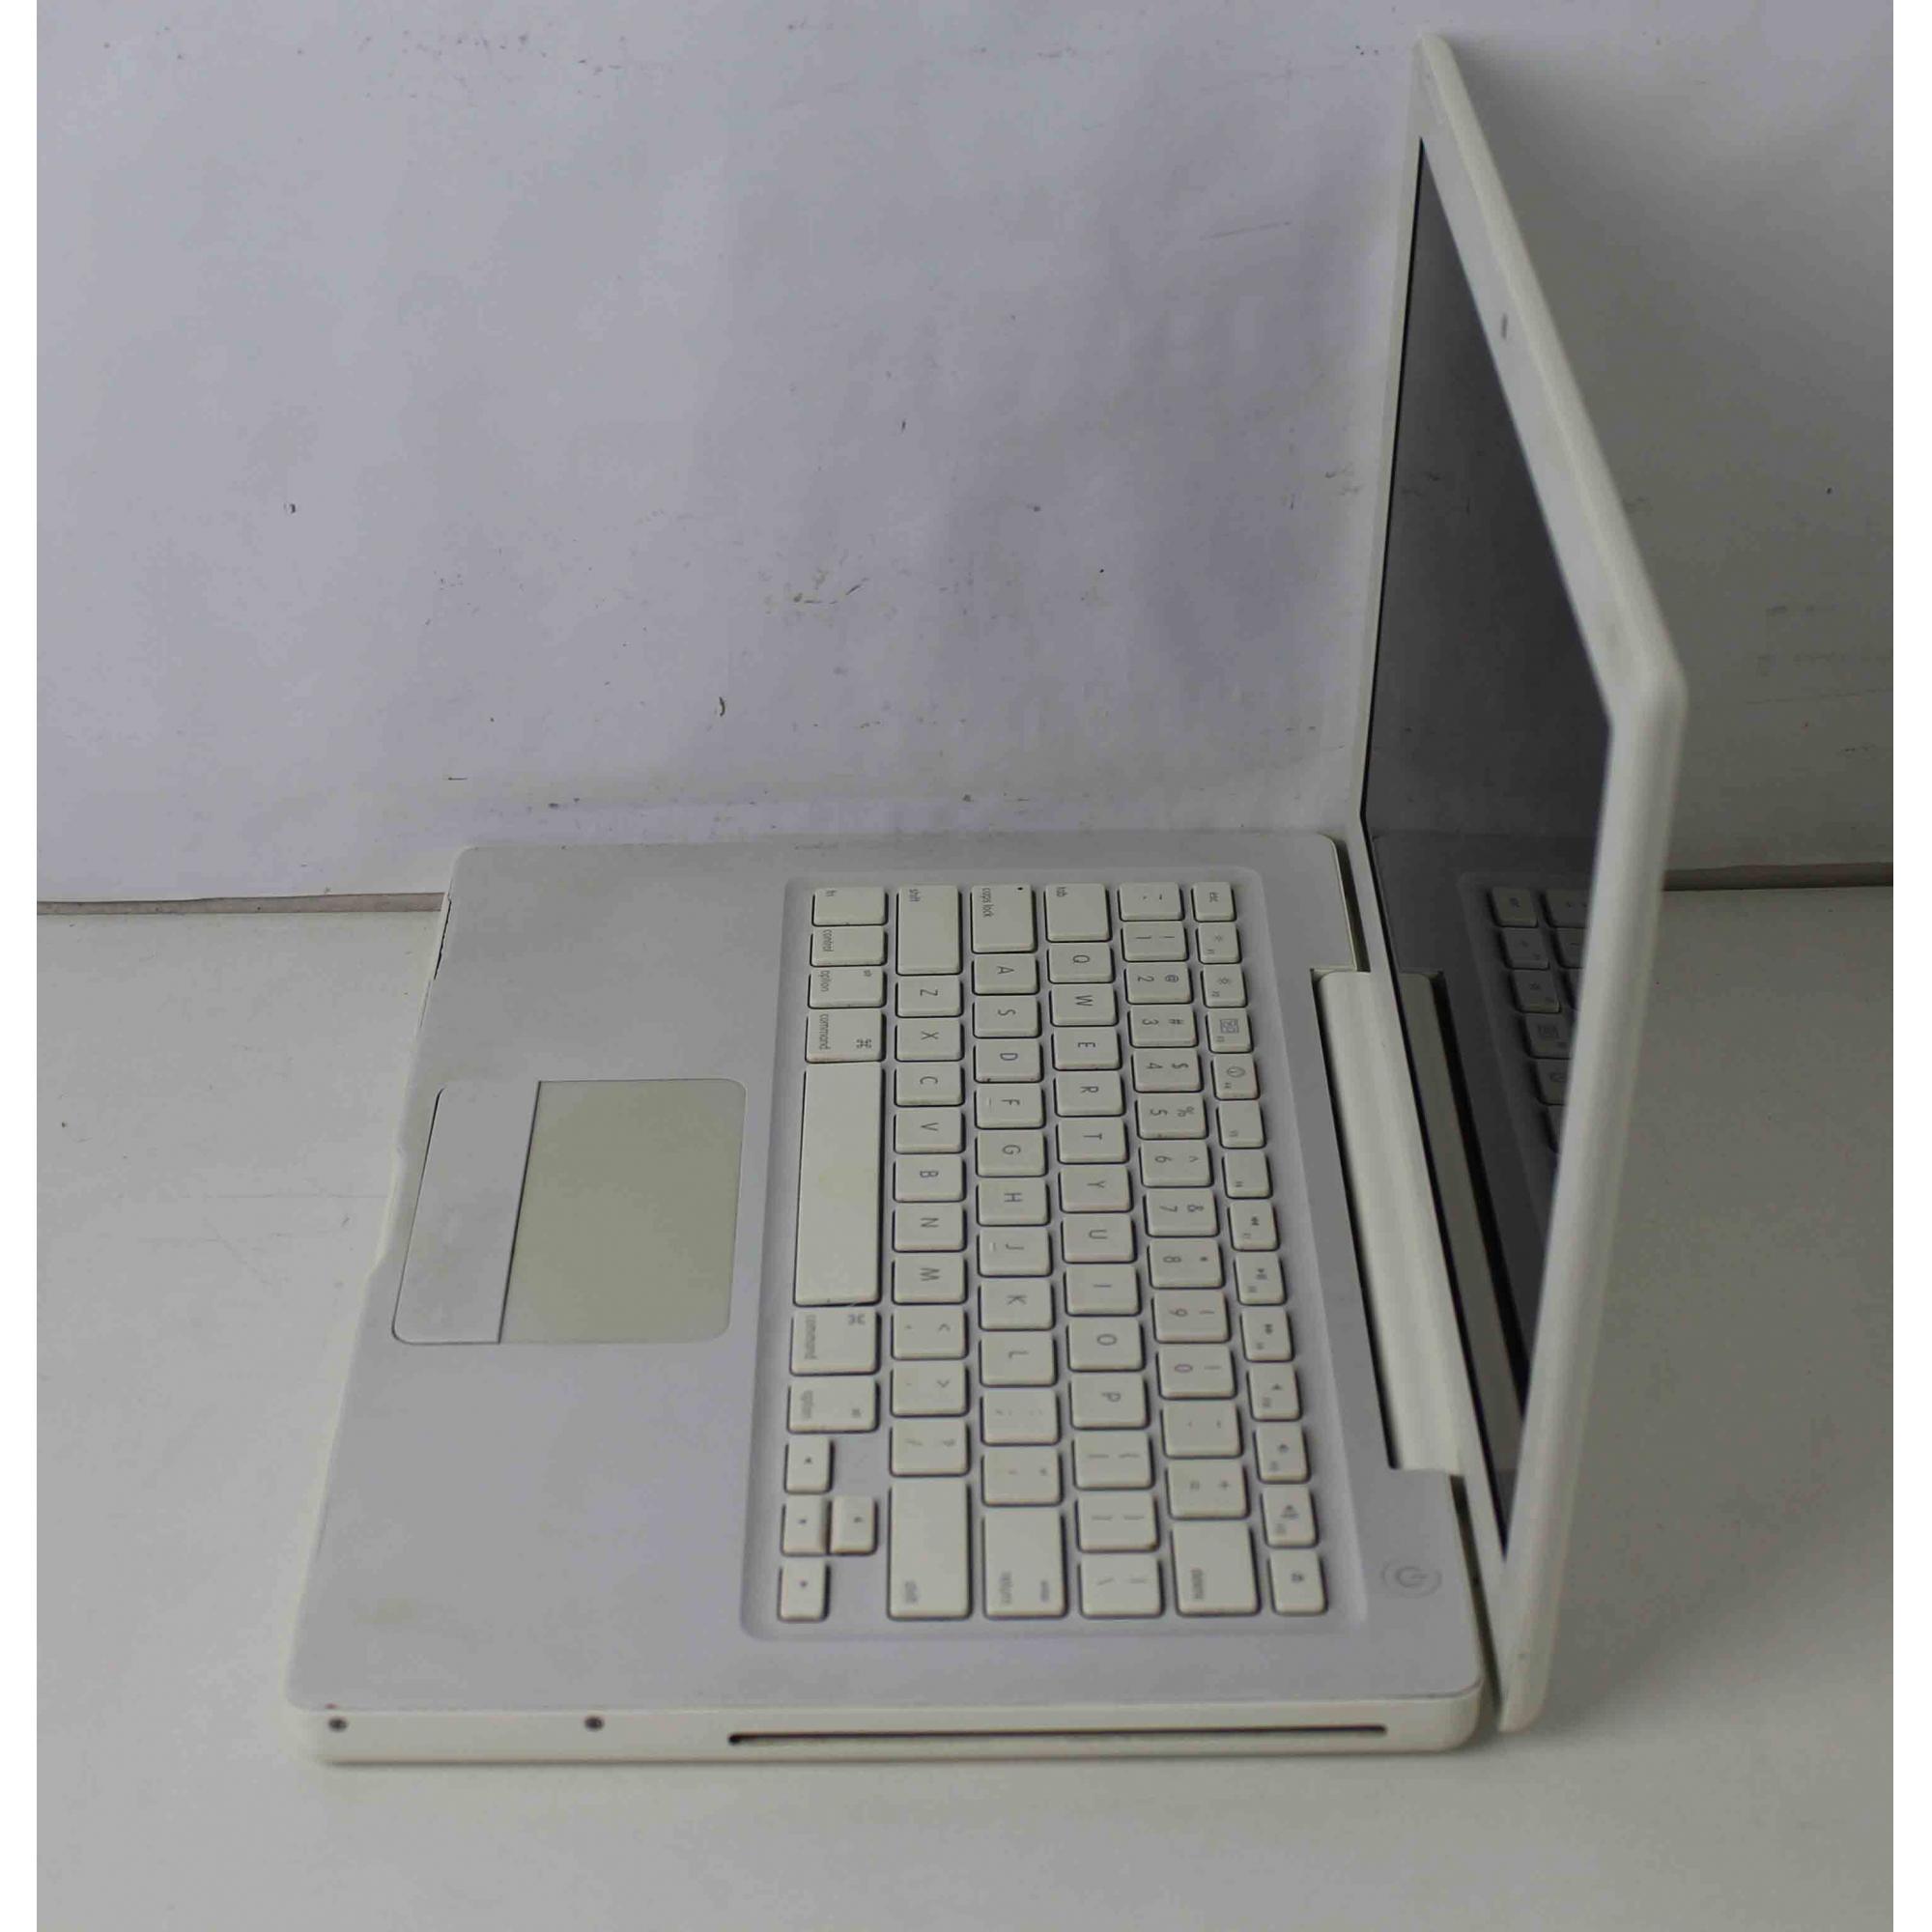 "Macbook White MB403LL/A 13.3"" Intel Core 2 Duo 2.4GHz 2GB HD-160GB (Não enviamos)"